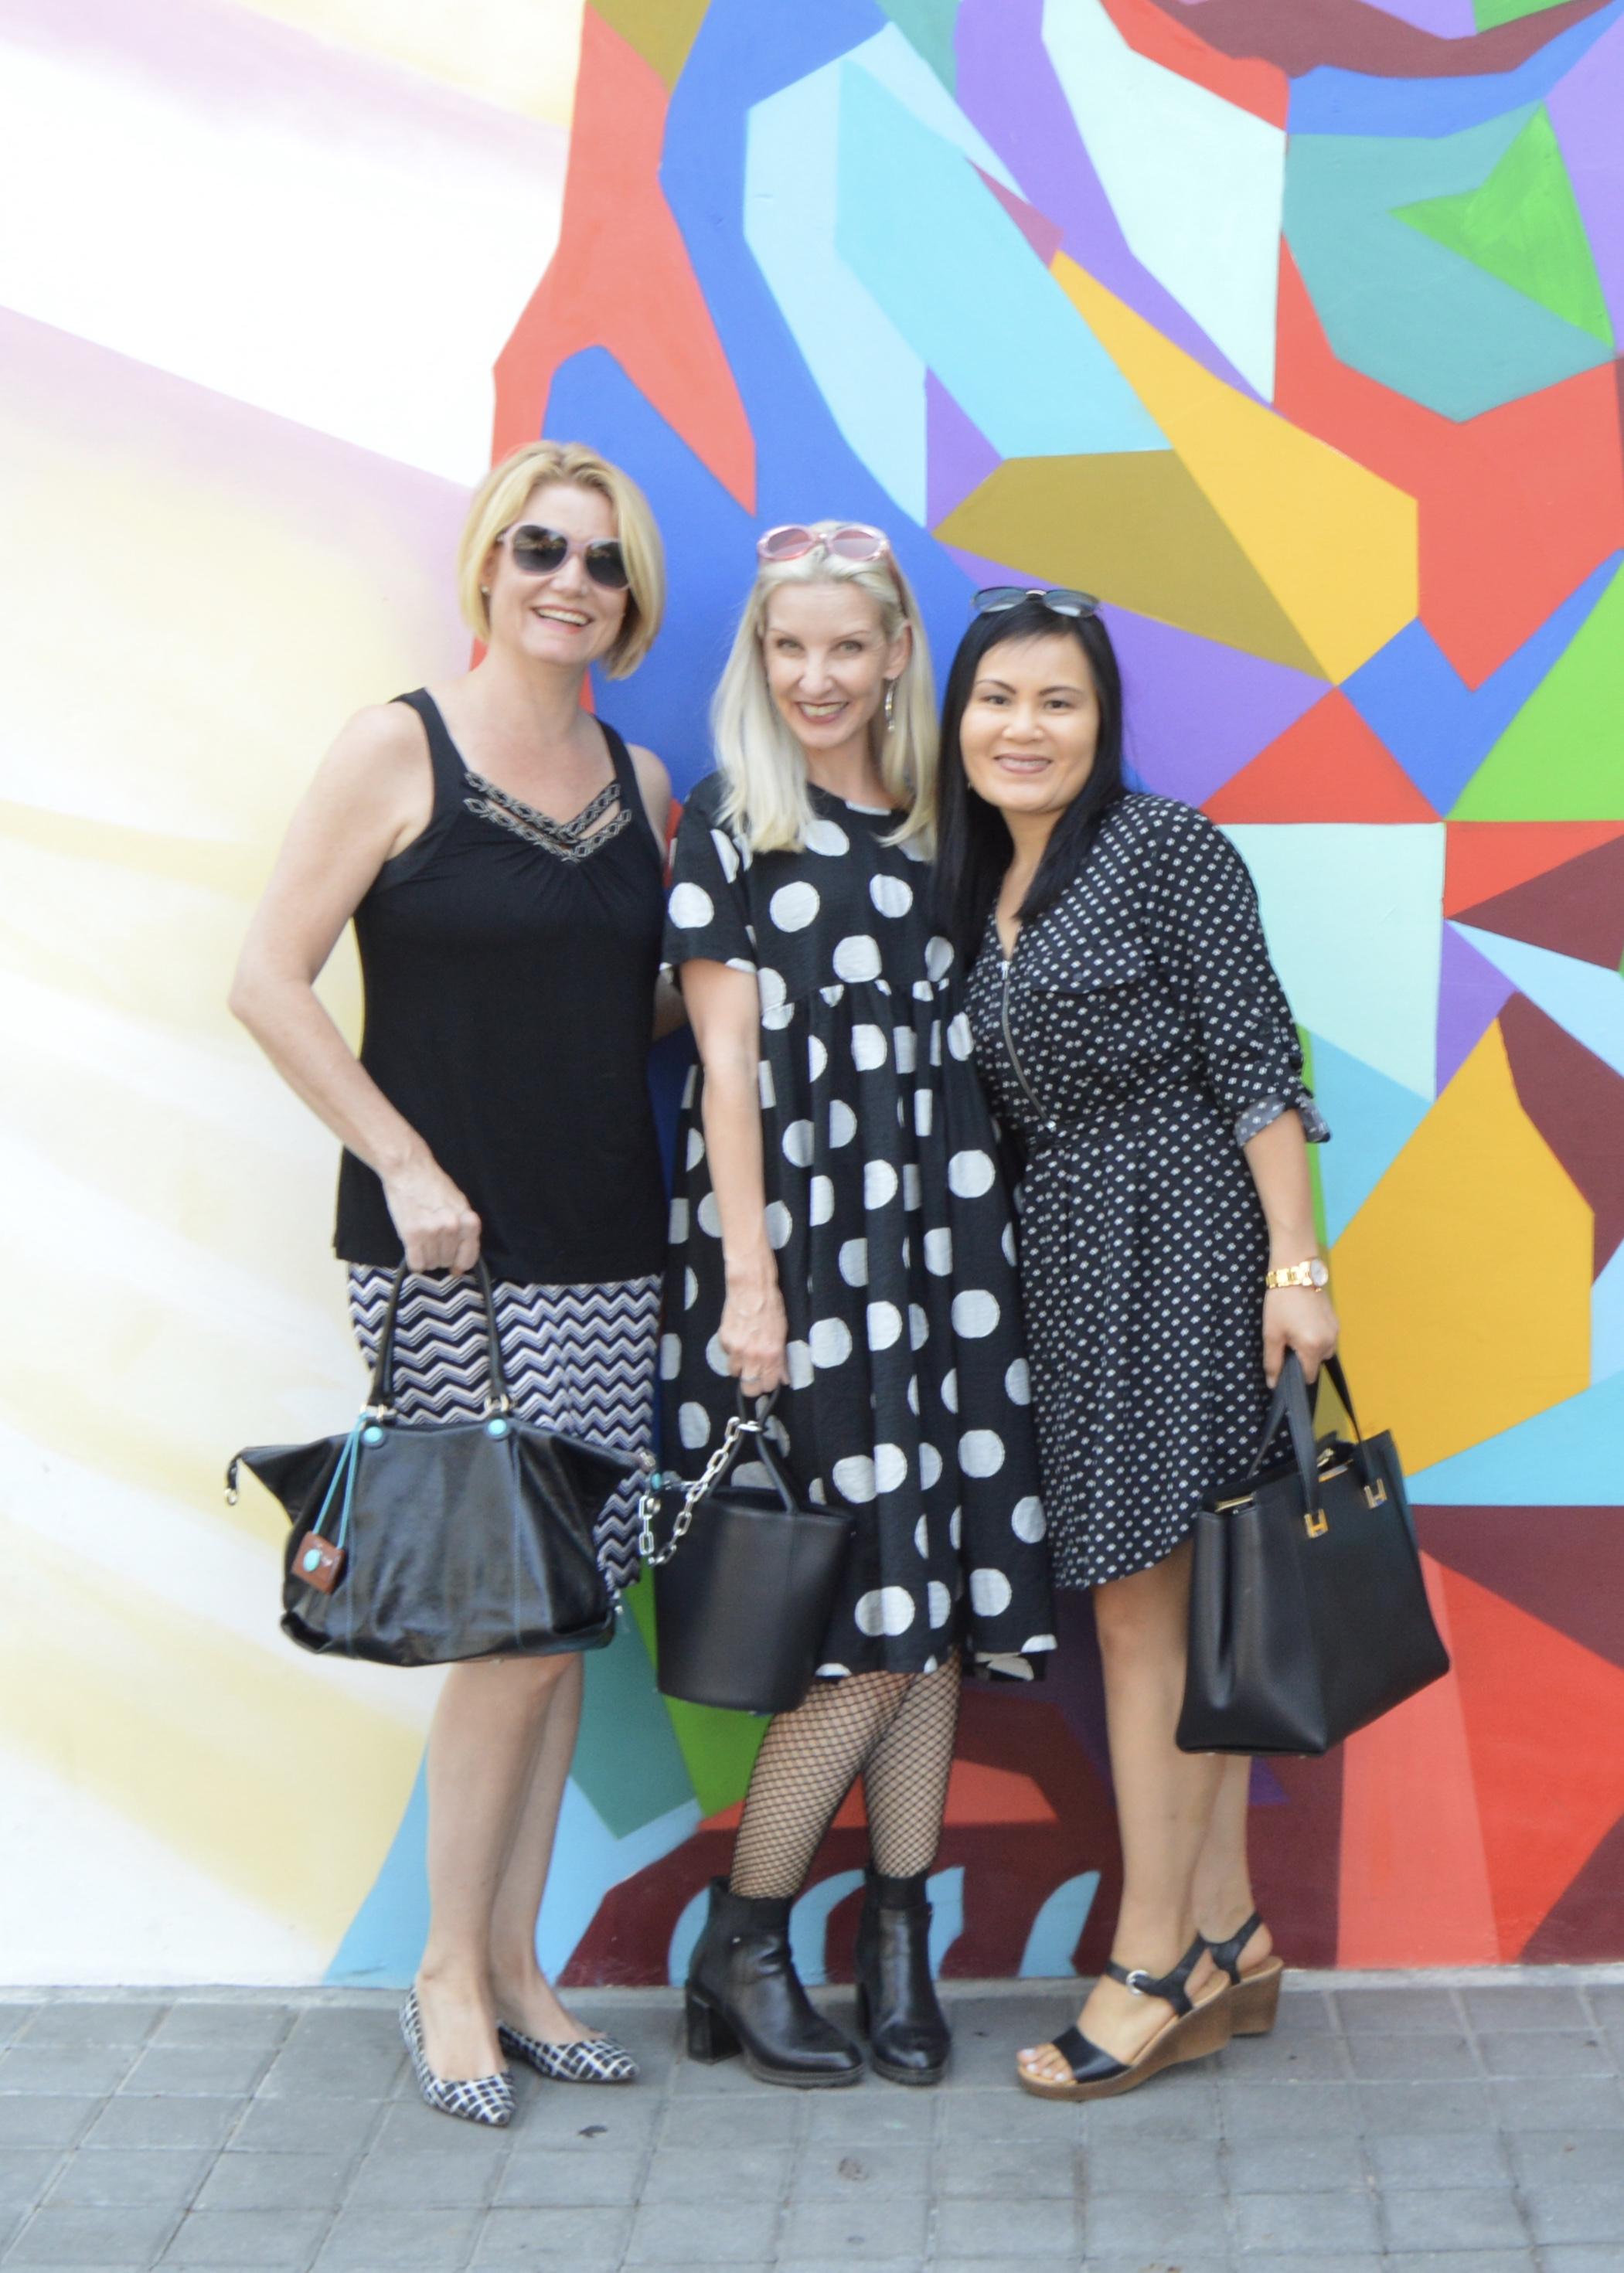 midlife bloggers, San Jose bloggers